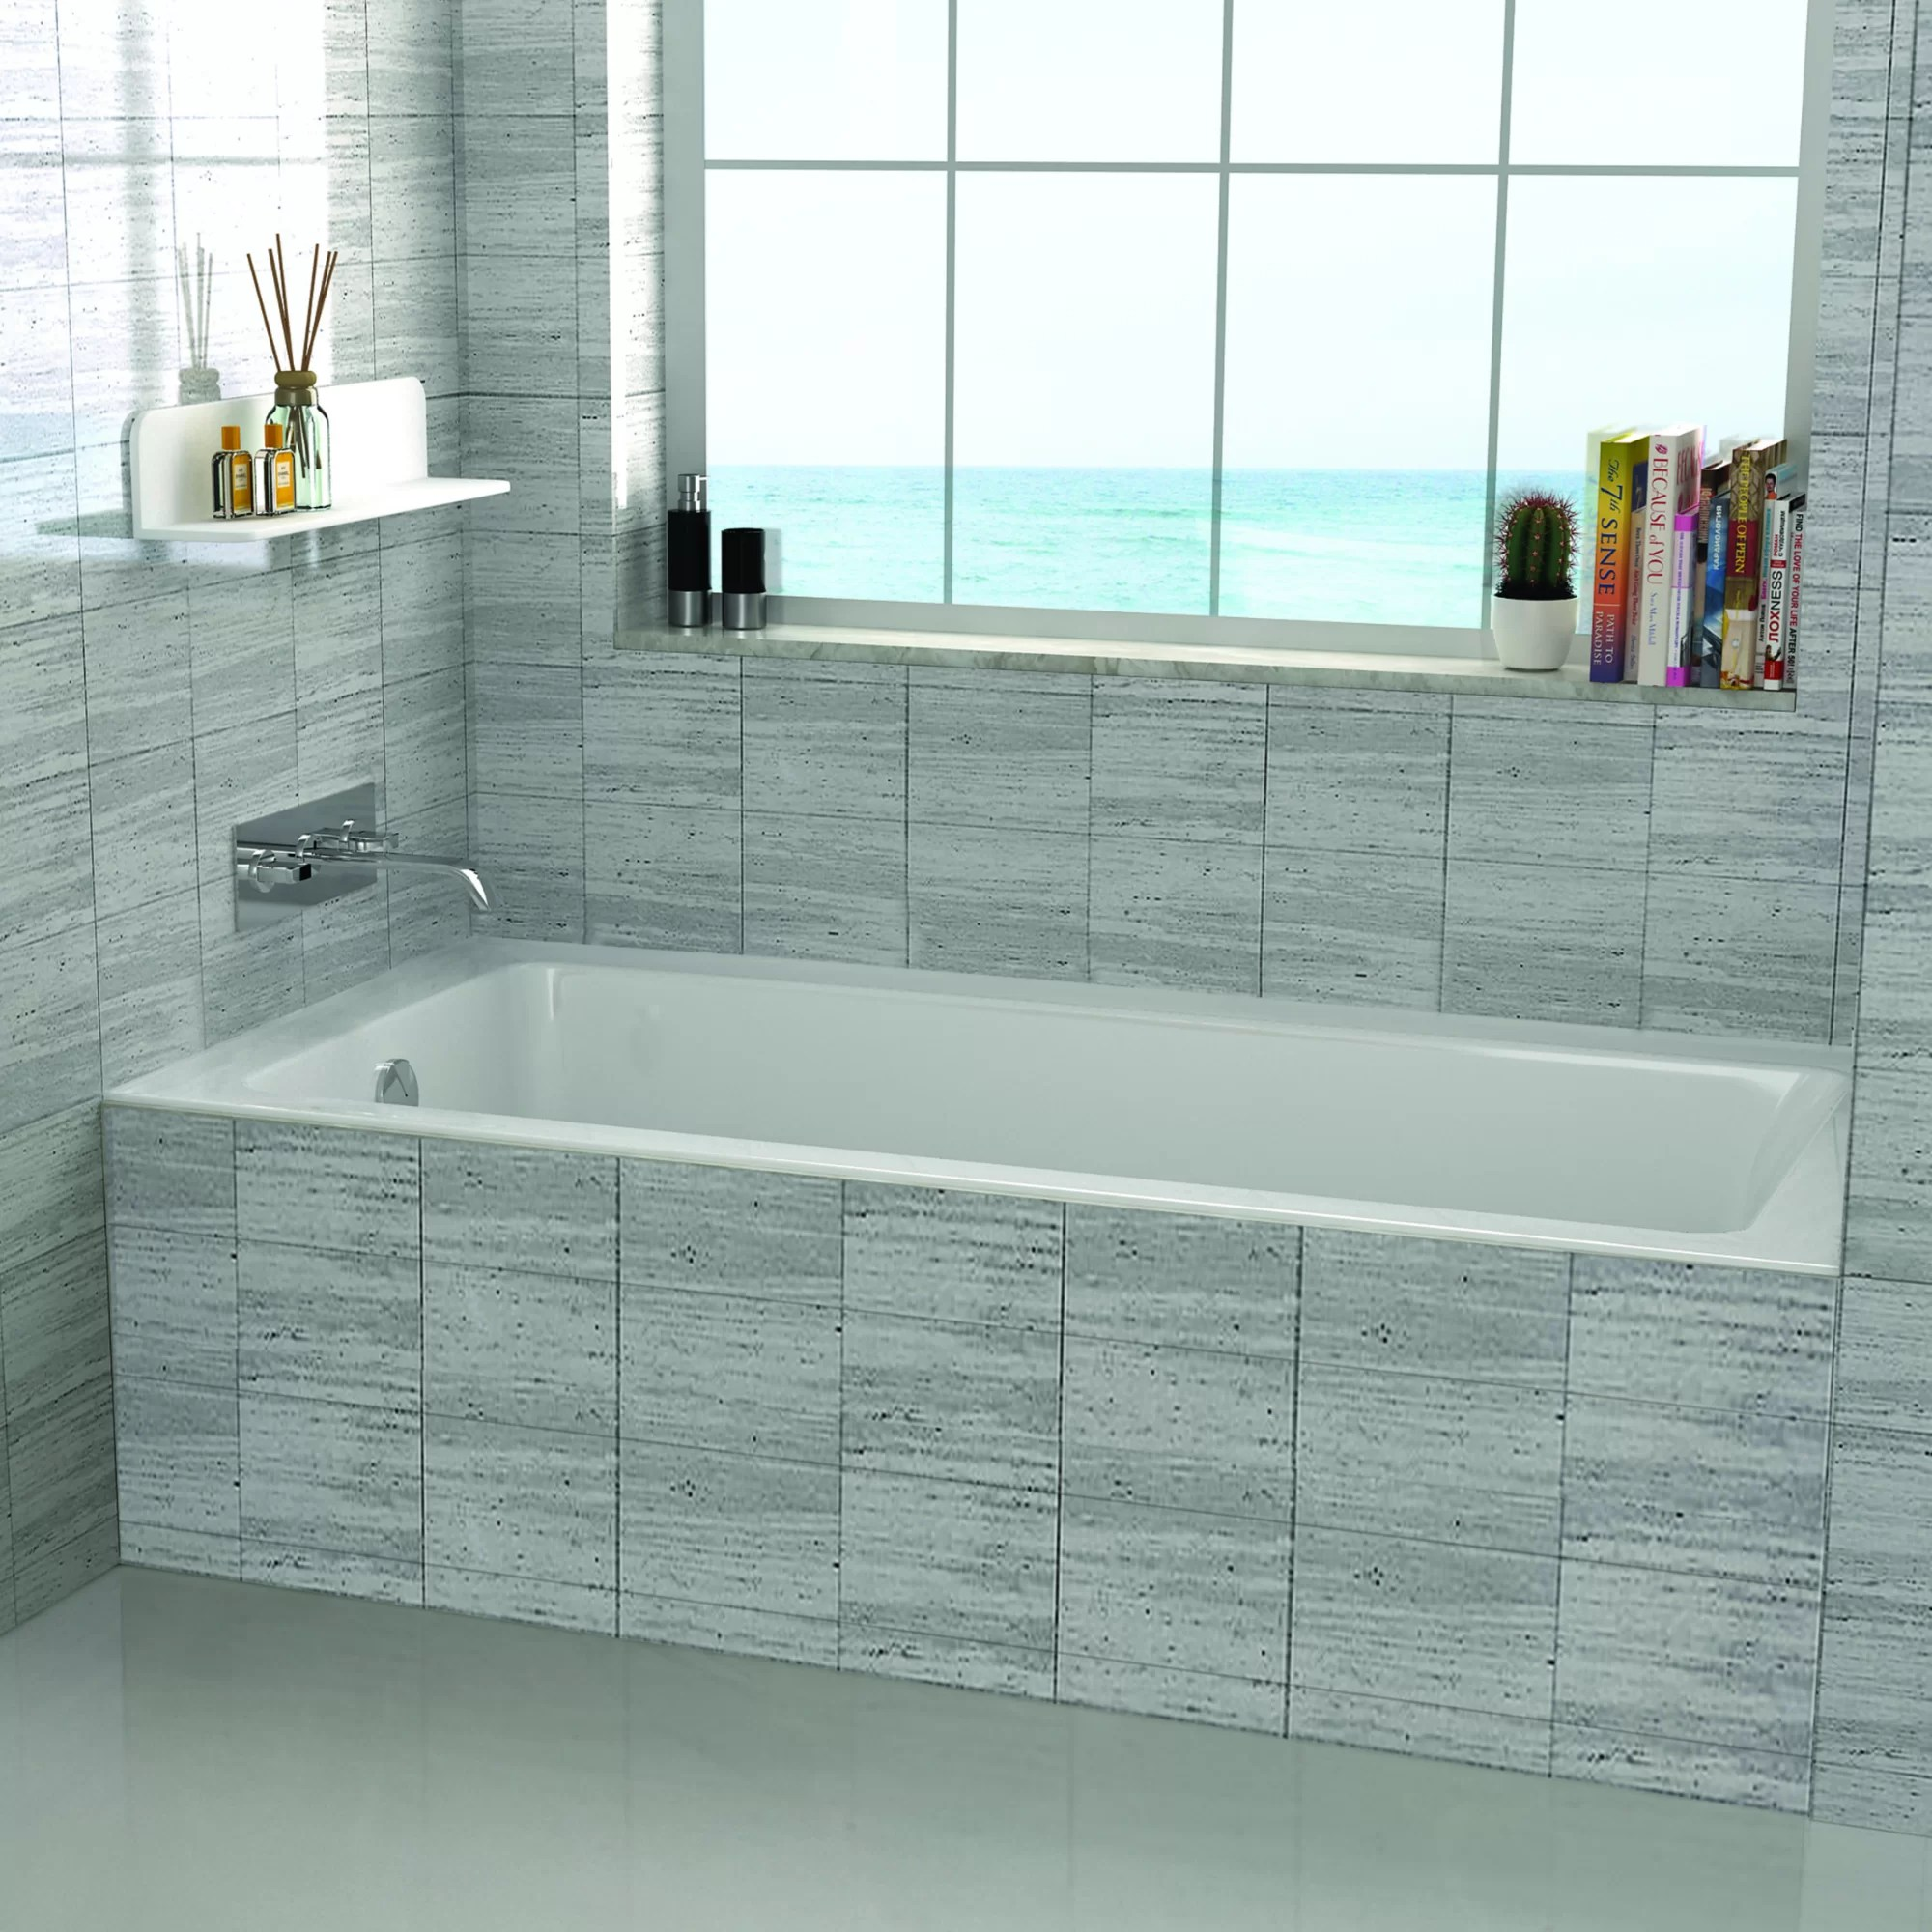 48 X 32 Drop In Soaking Bathtub